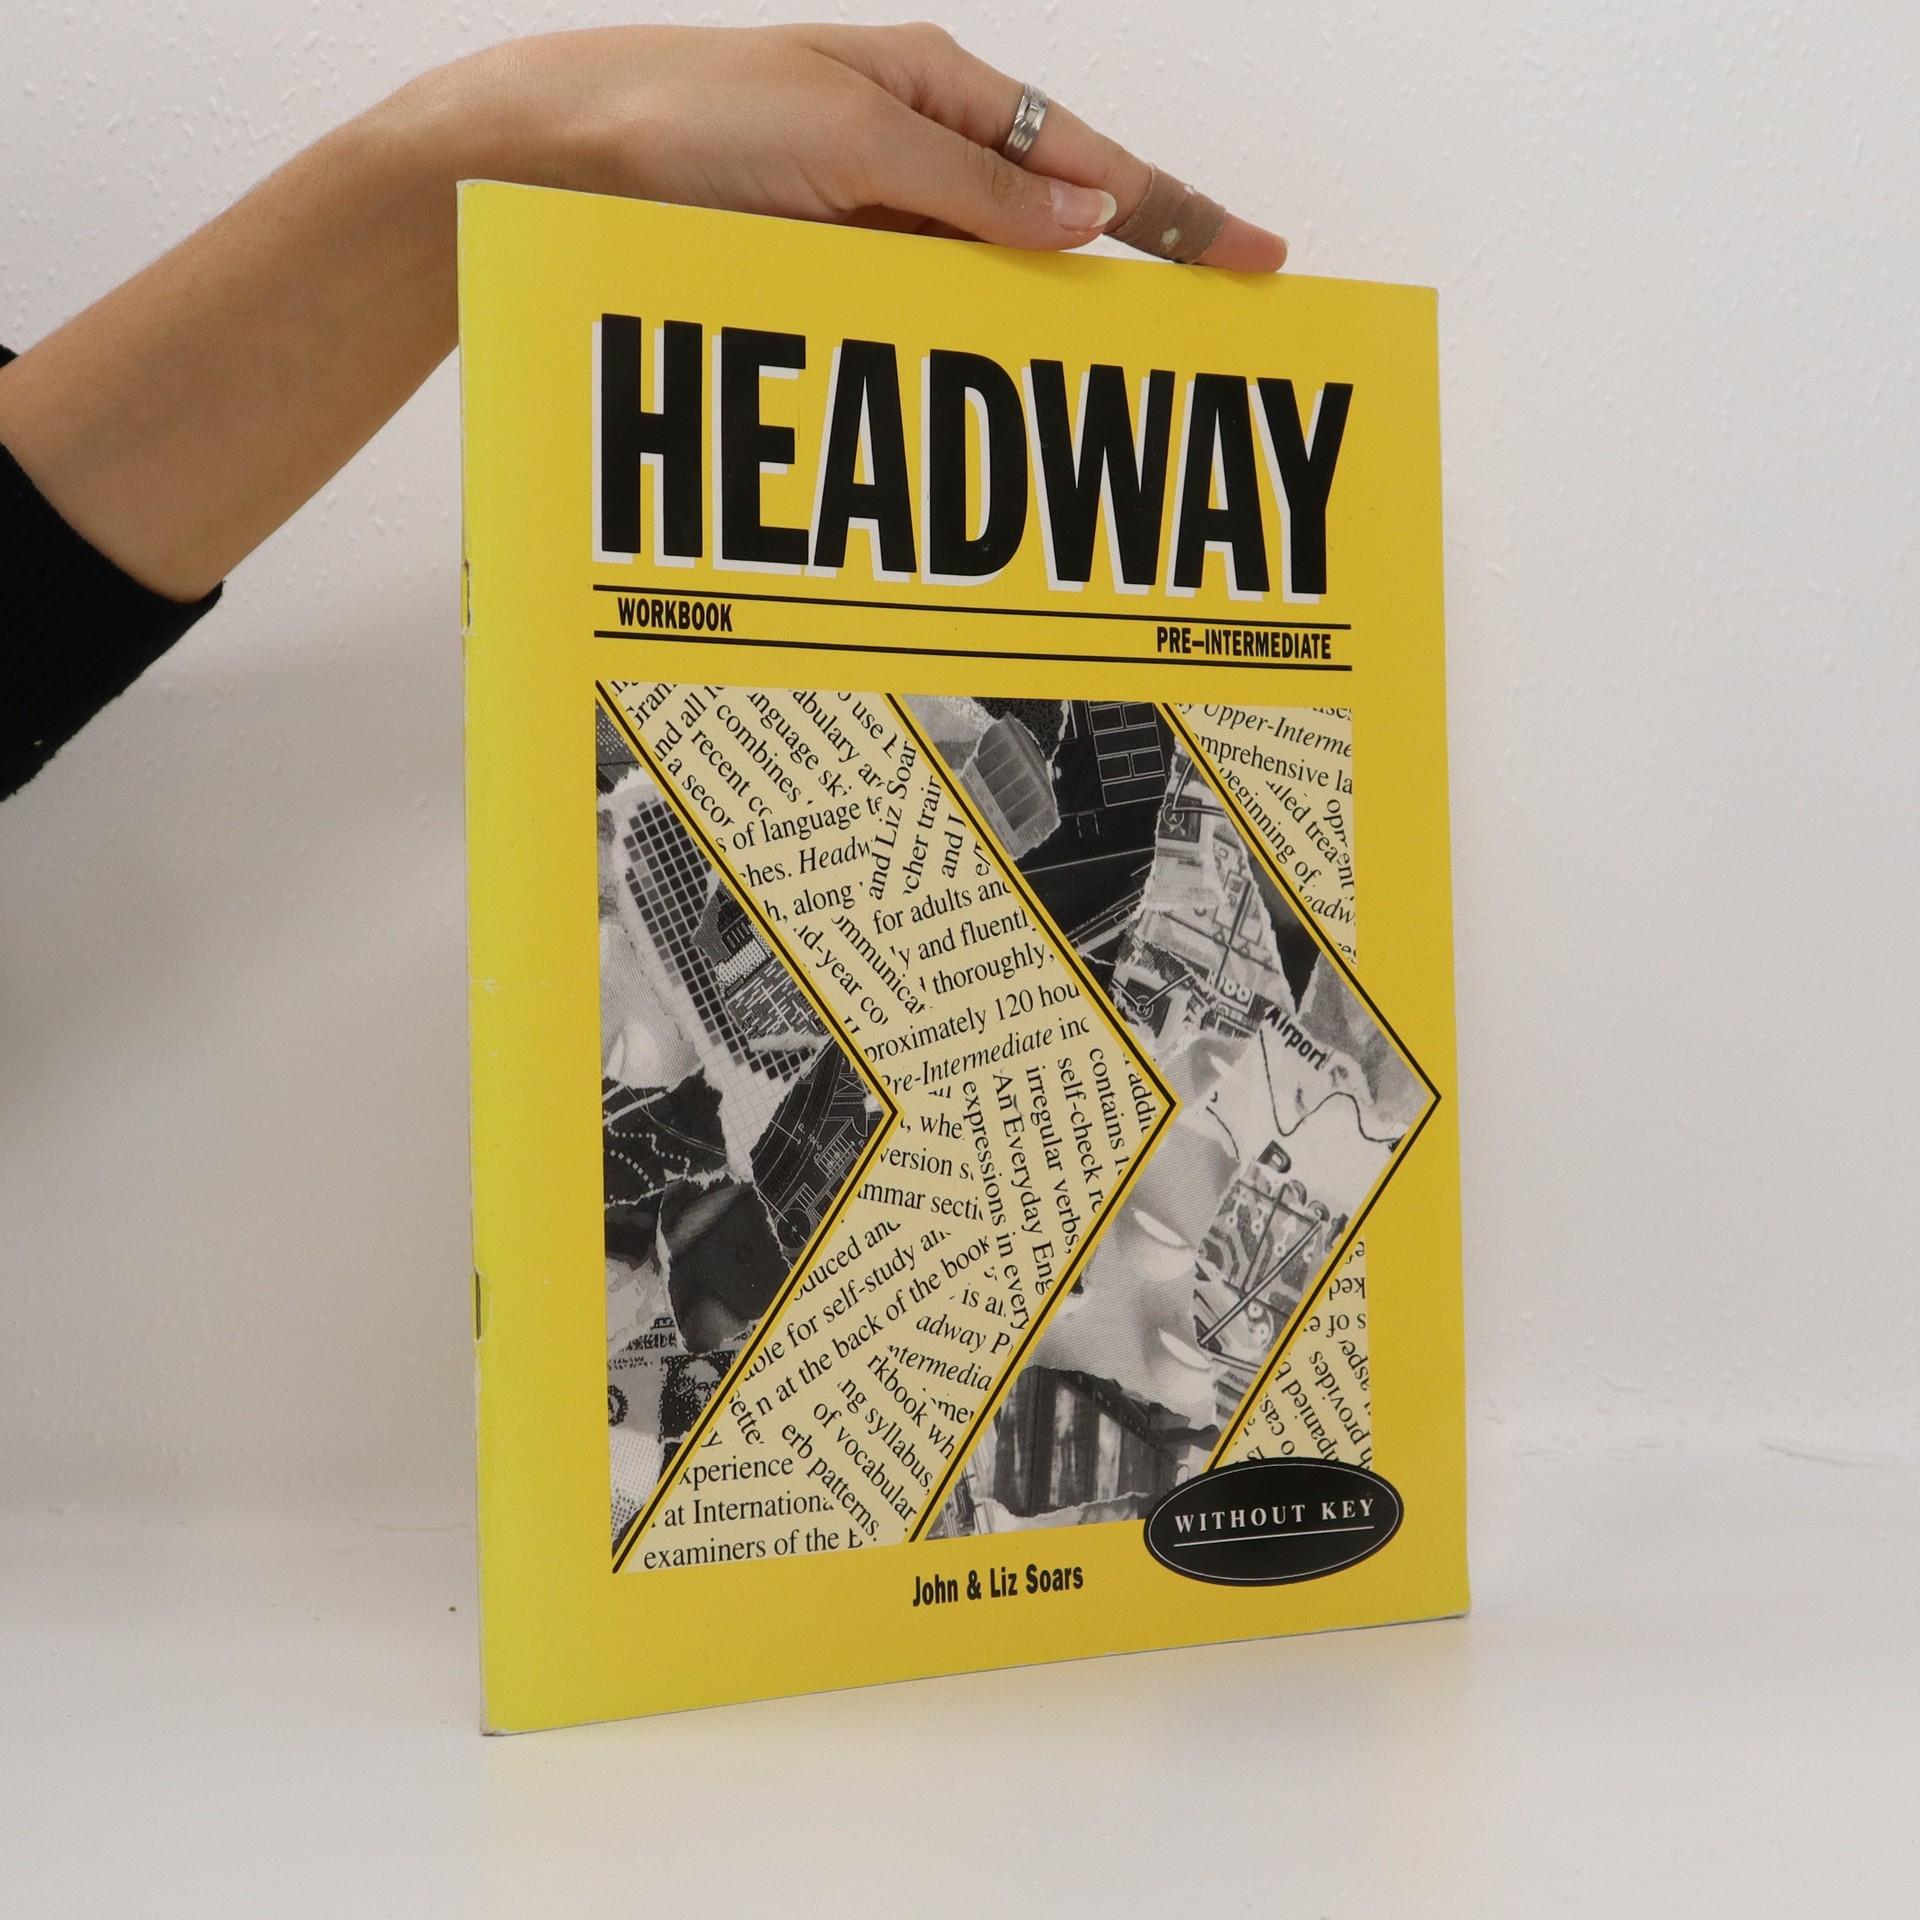 antikvární kniha Headway pre-intermediate. Workbook, 1997